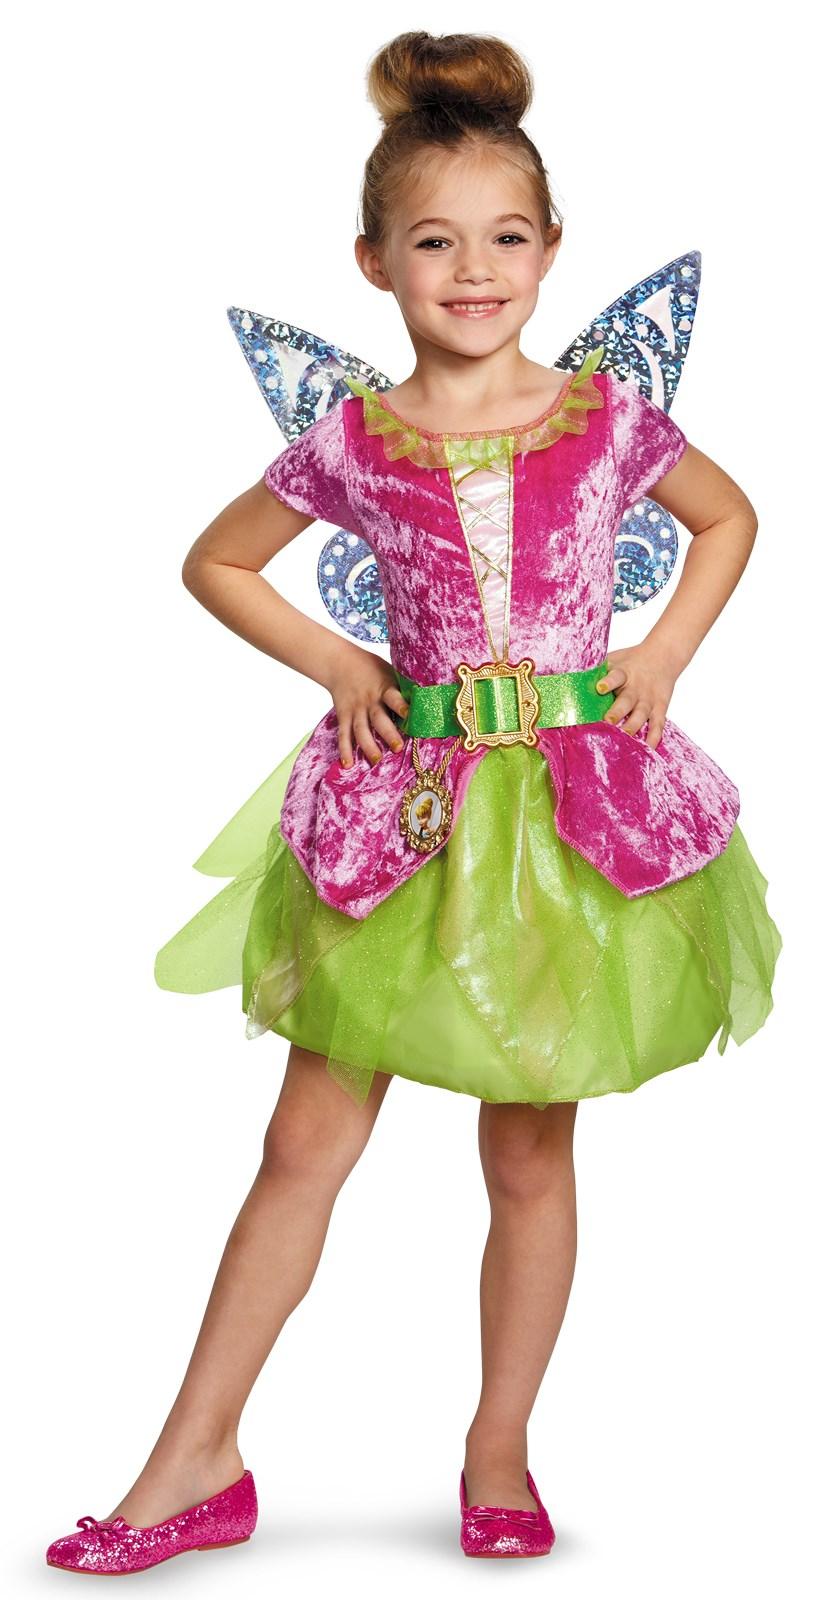 Fairy & Elf Costumes | BuyCostumes.com